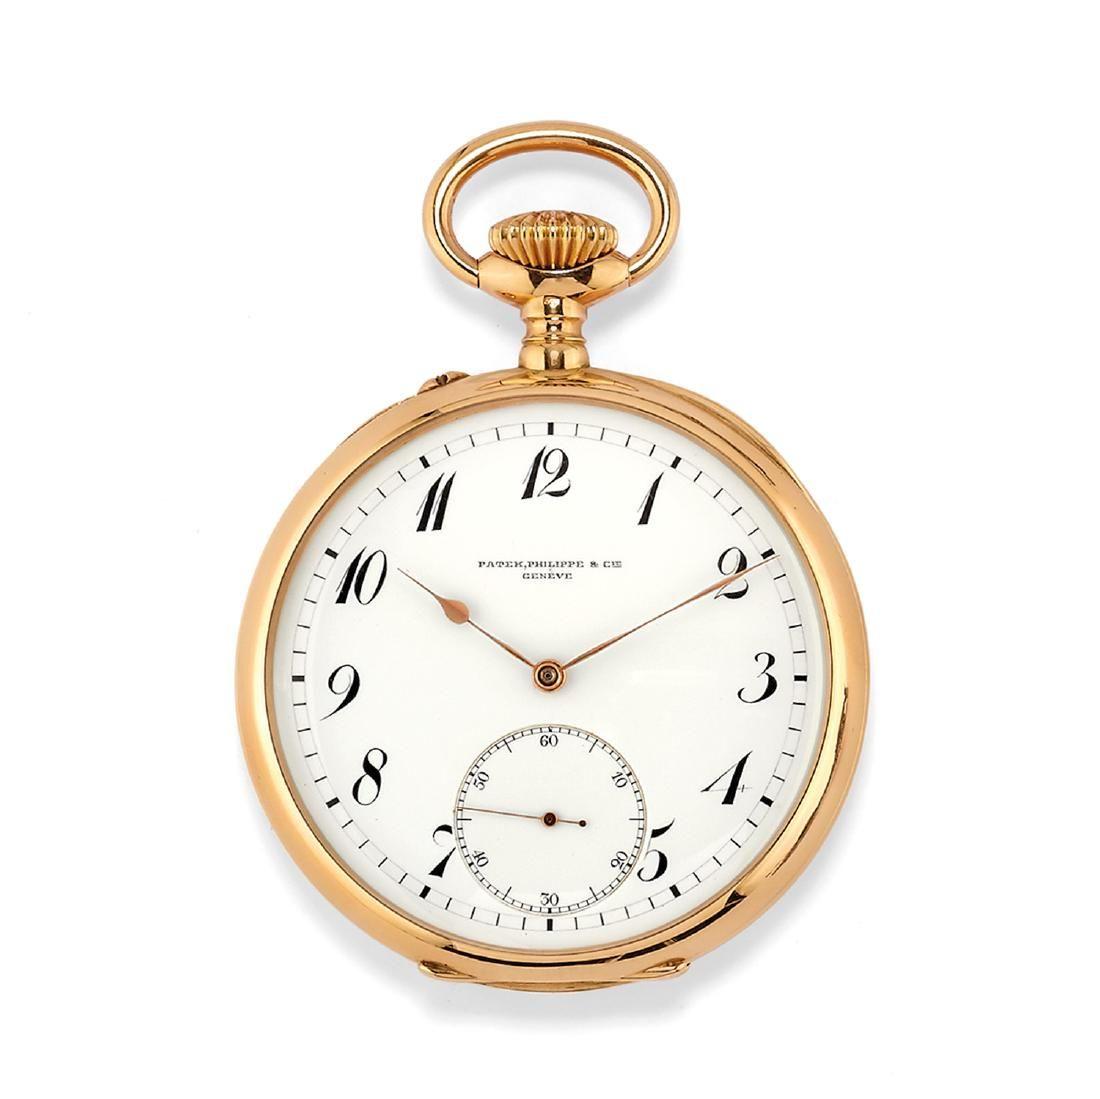 Patek Philippe  - A gold pocket watch, Patek Philippe